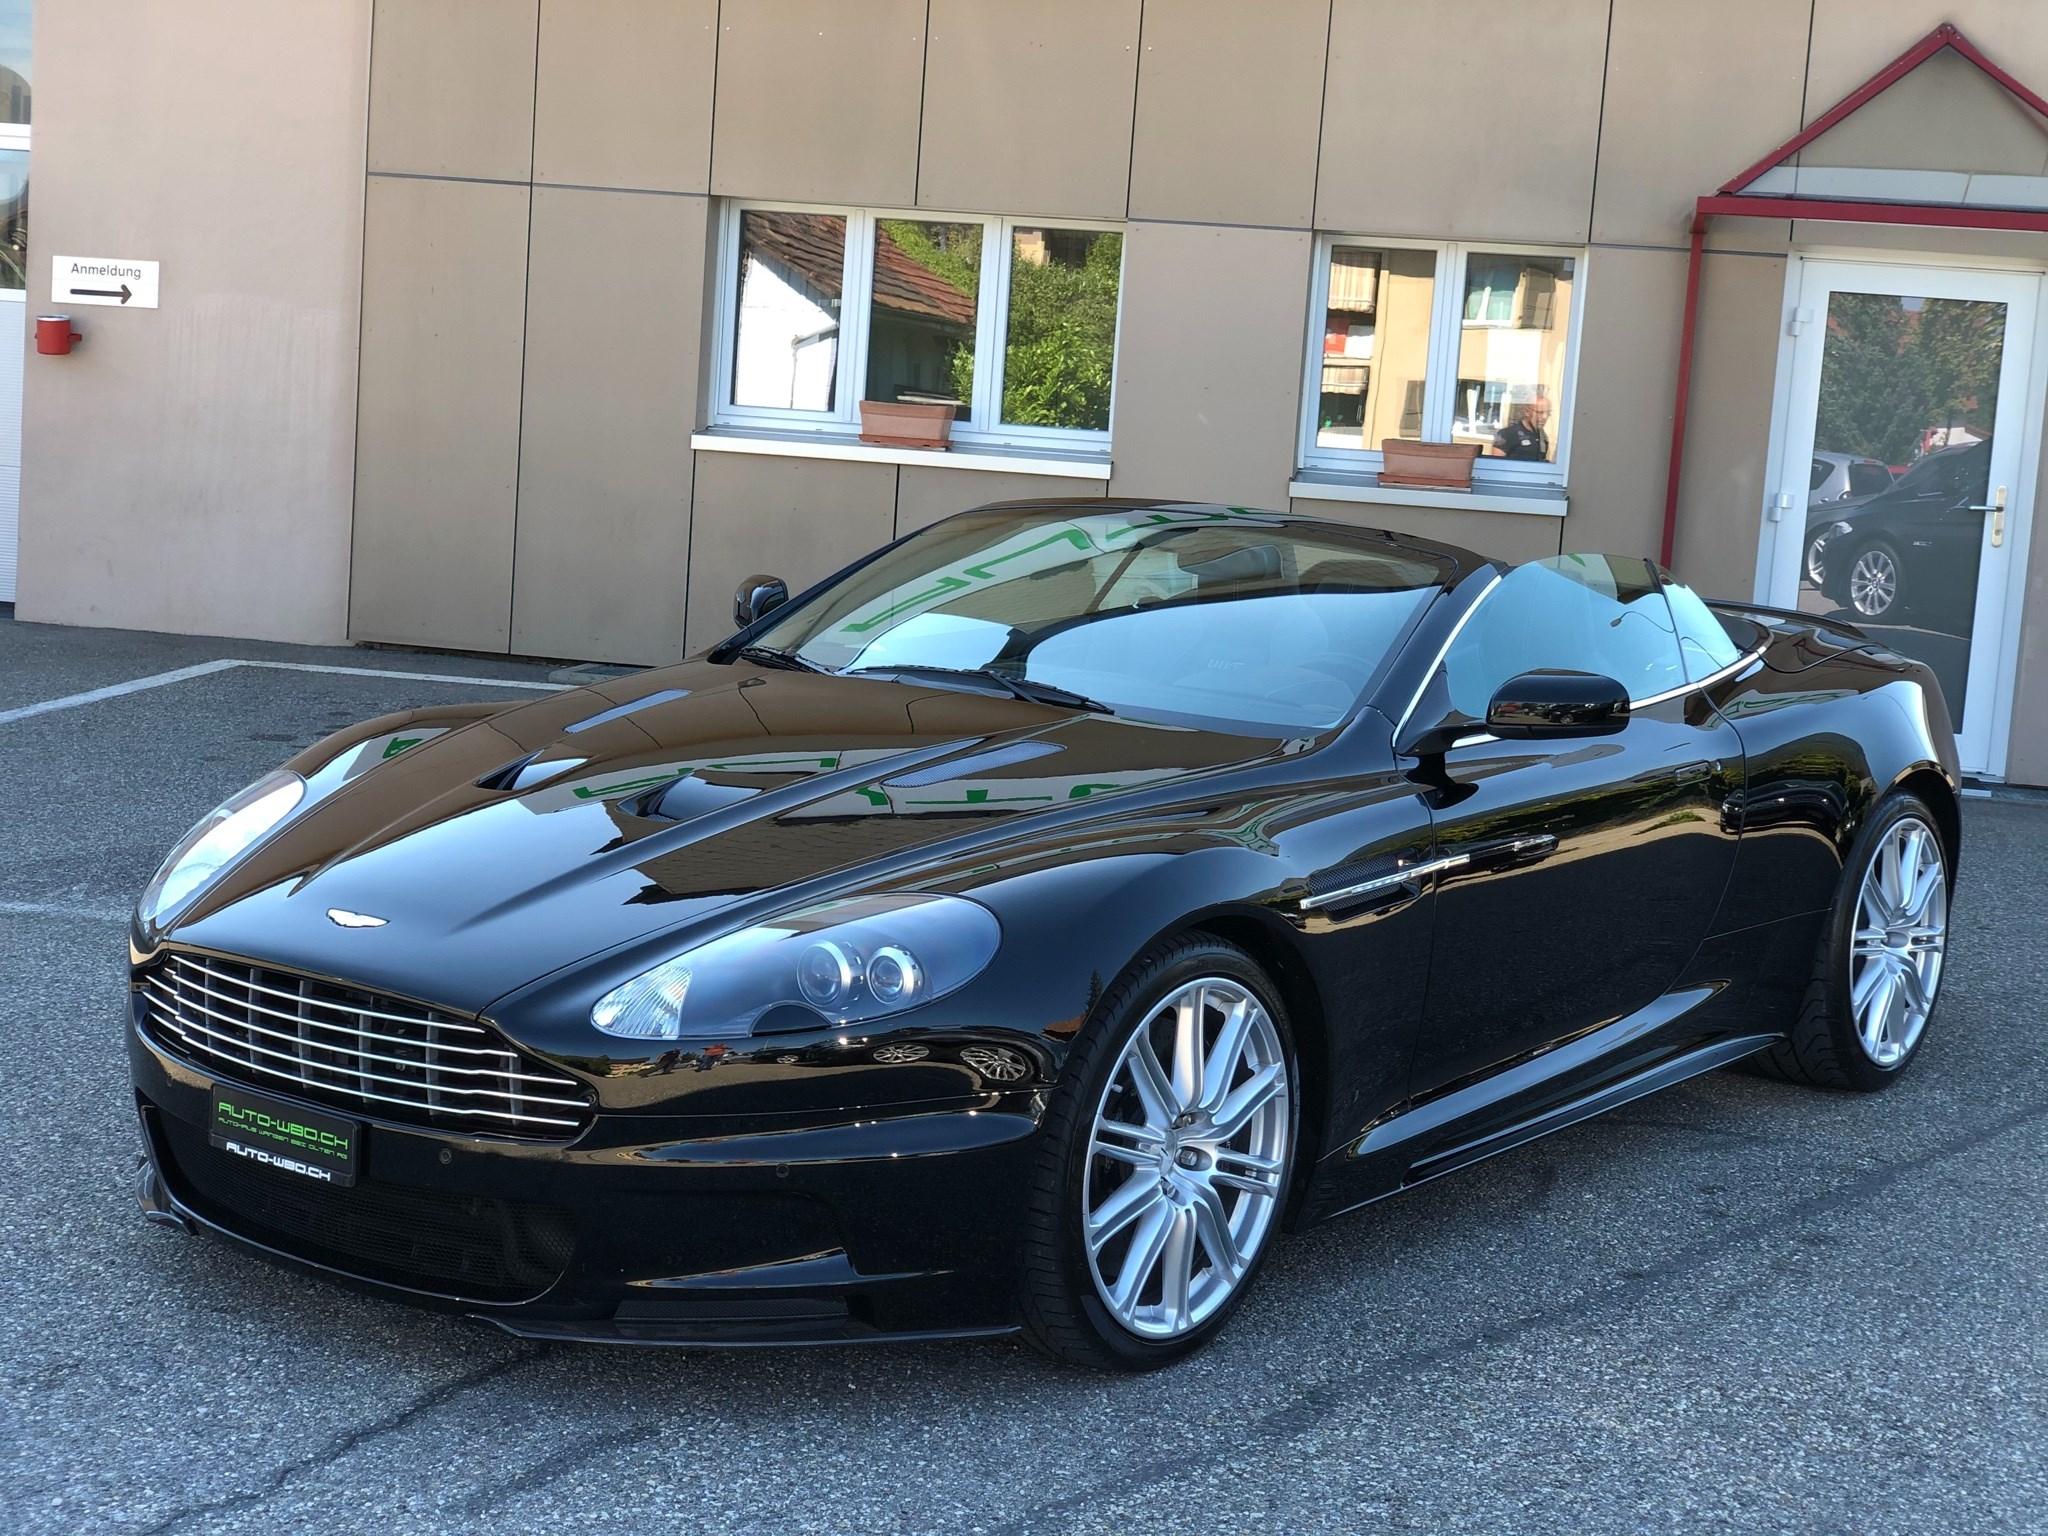 Aston Martin Db9 Dbs Dbs Volante Touchtronic 2 I 517 Ps I 30000 Km Für 109850 Chf Kaufen Auf Carforyou Ch